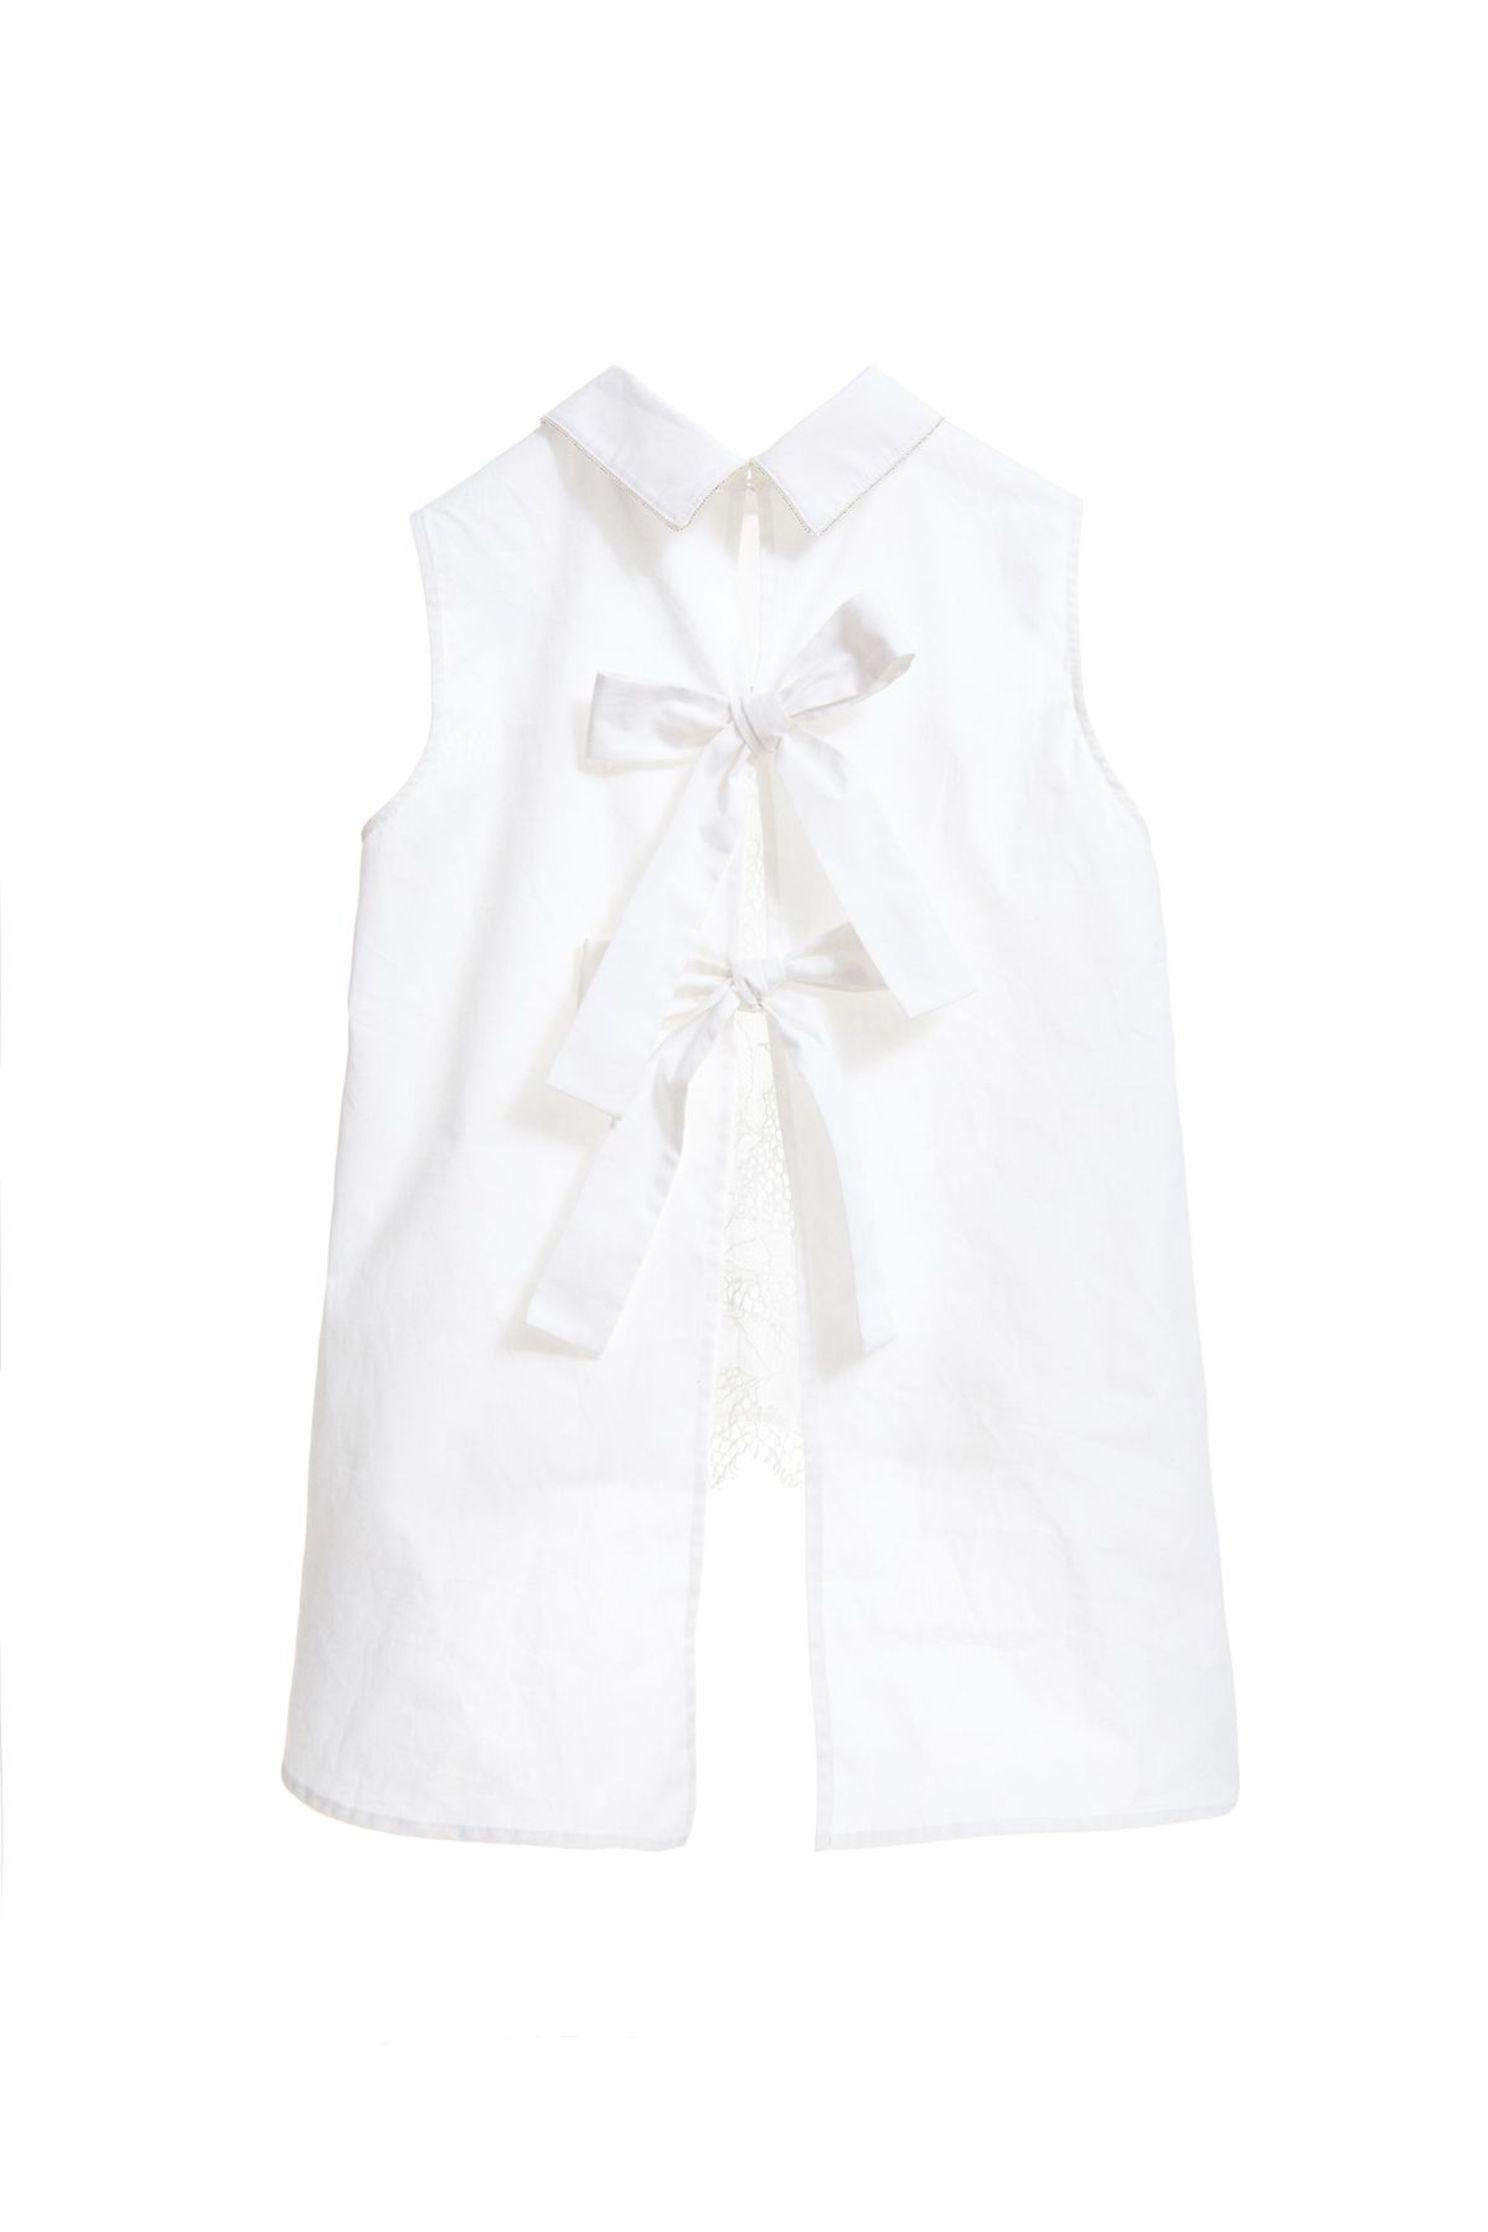 Woman design sleeveless vest,Singlet,無袖背心,白色背心,vest,Lace,蕾絲背心,Blouse